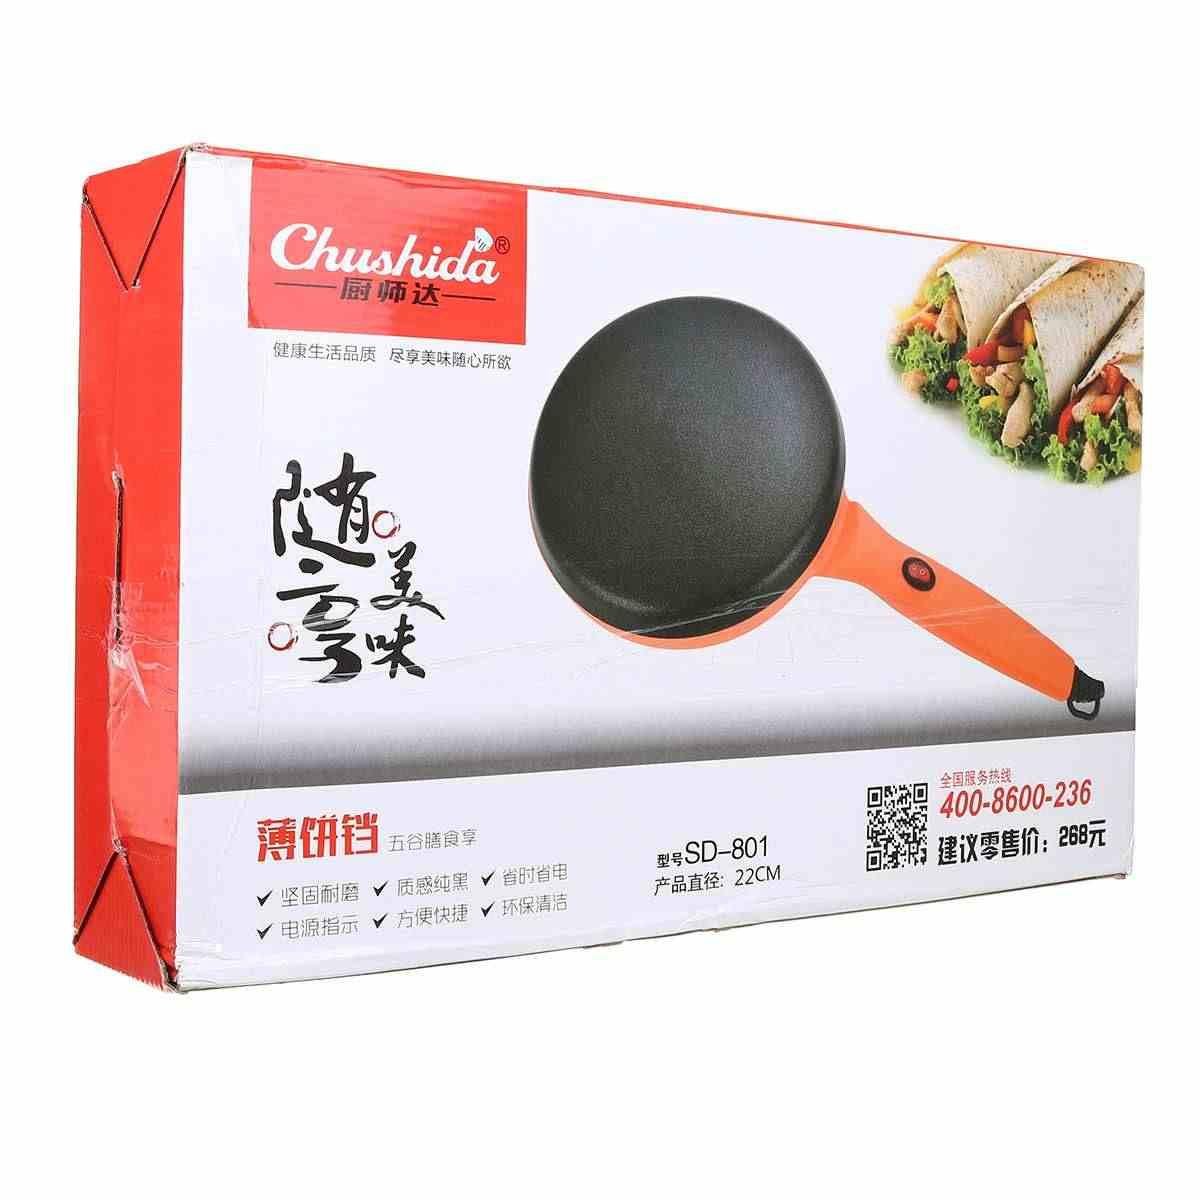 900W 220V שאינו מקל חשמלי קרפ פיצה יצרנית פנקייק מכונה שאינו מקל מחבת עוגת תבנית אפיית מכונה מטבח בישול כלים